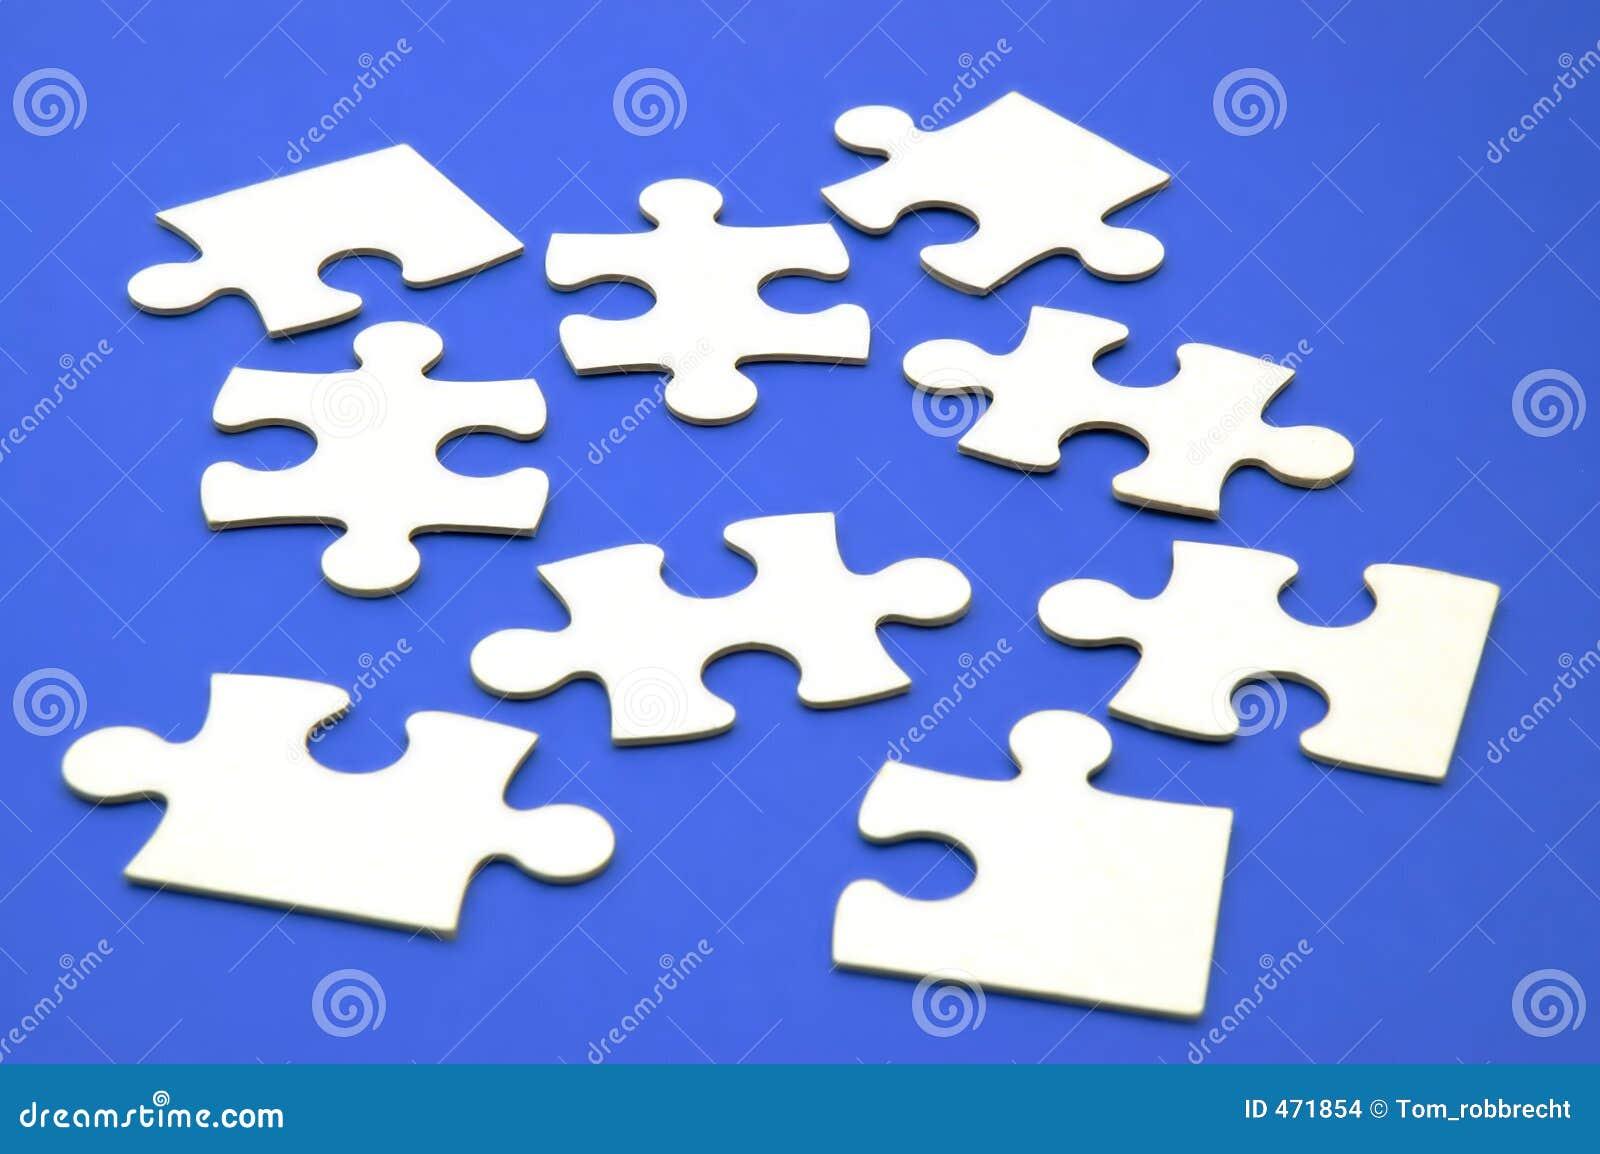 Jigsaw pieces blue